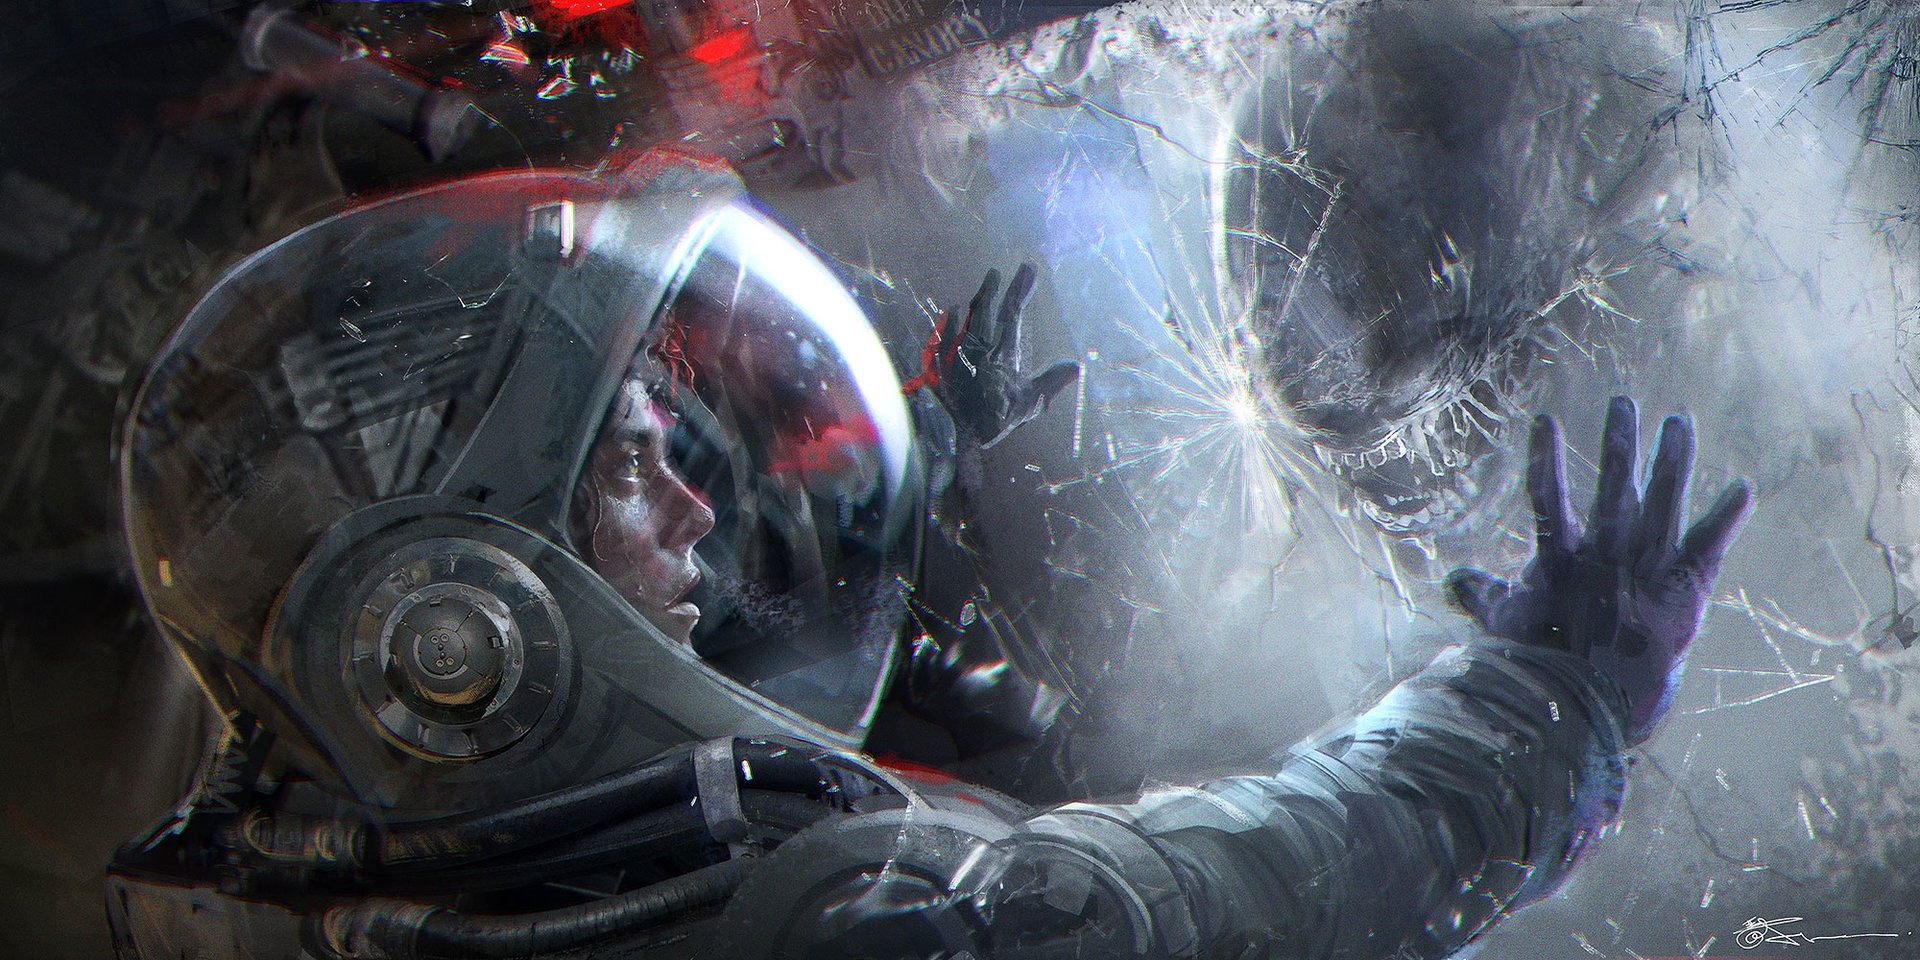 Jeremy chong 150830 alien space